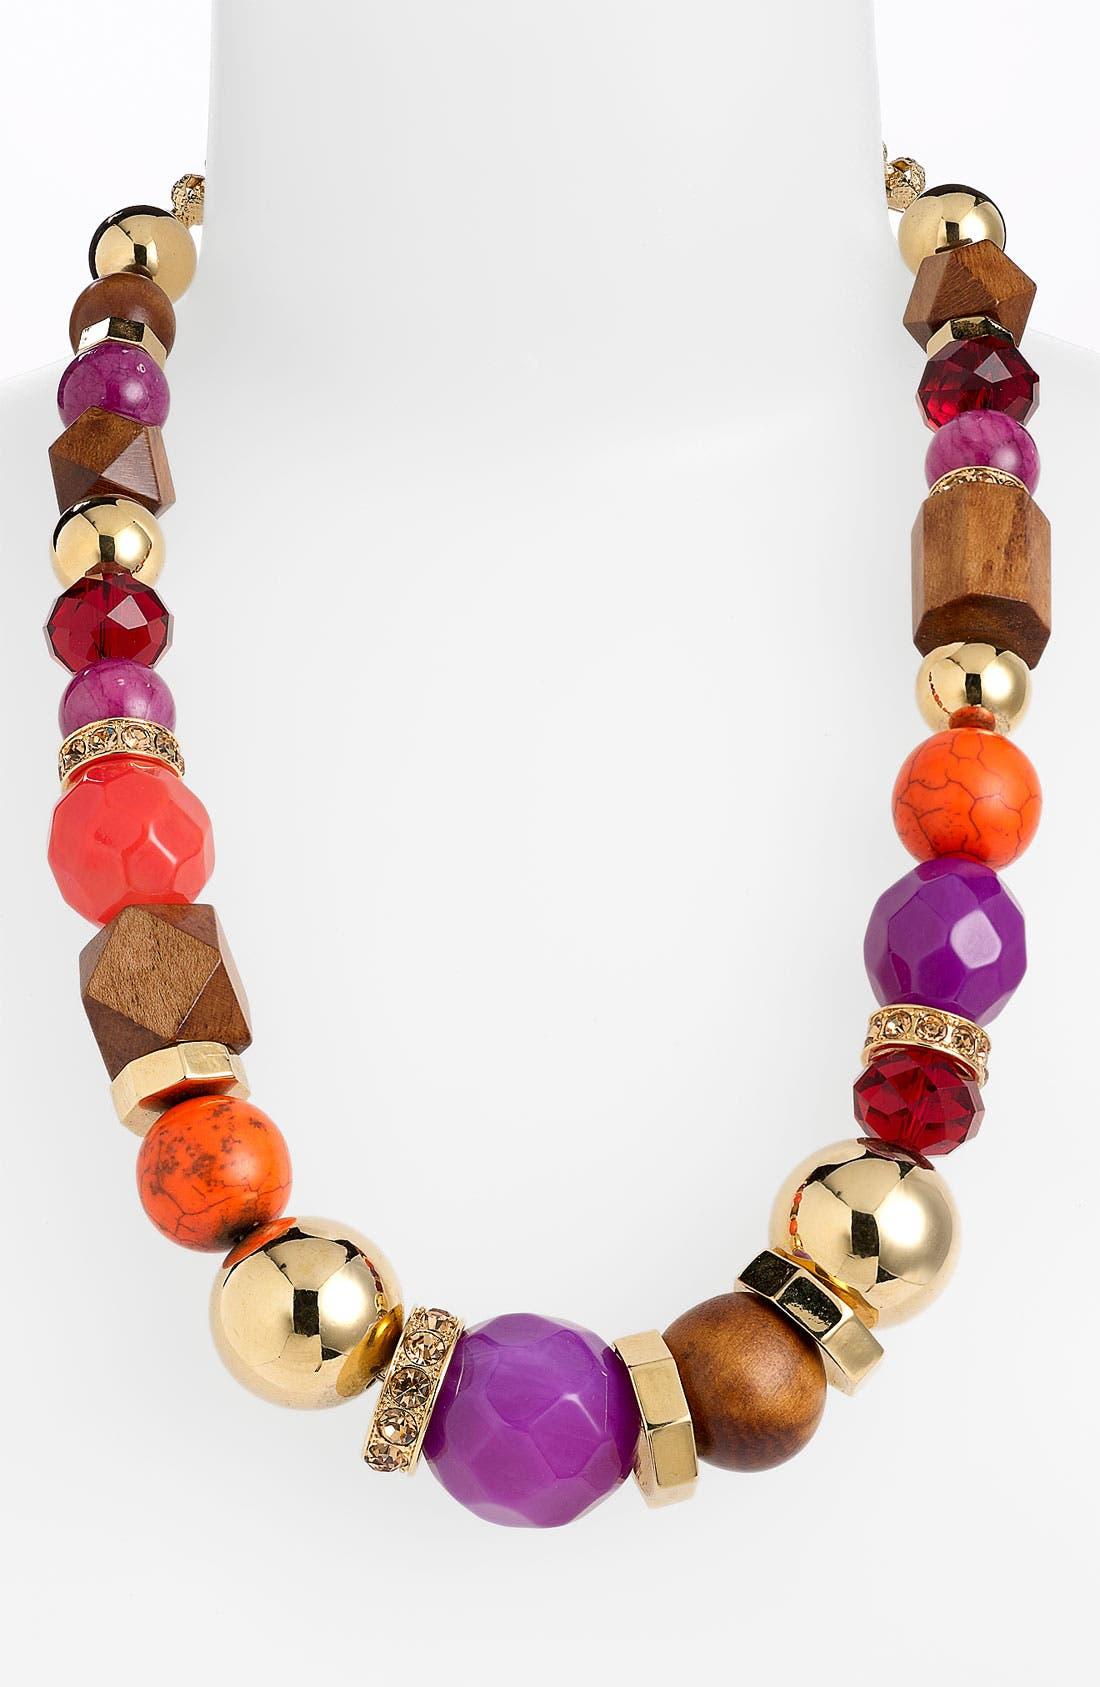 Alternate Image 1 Selected - kate spade new york 'totem park' necklace